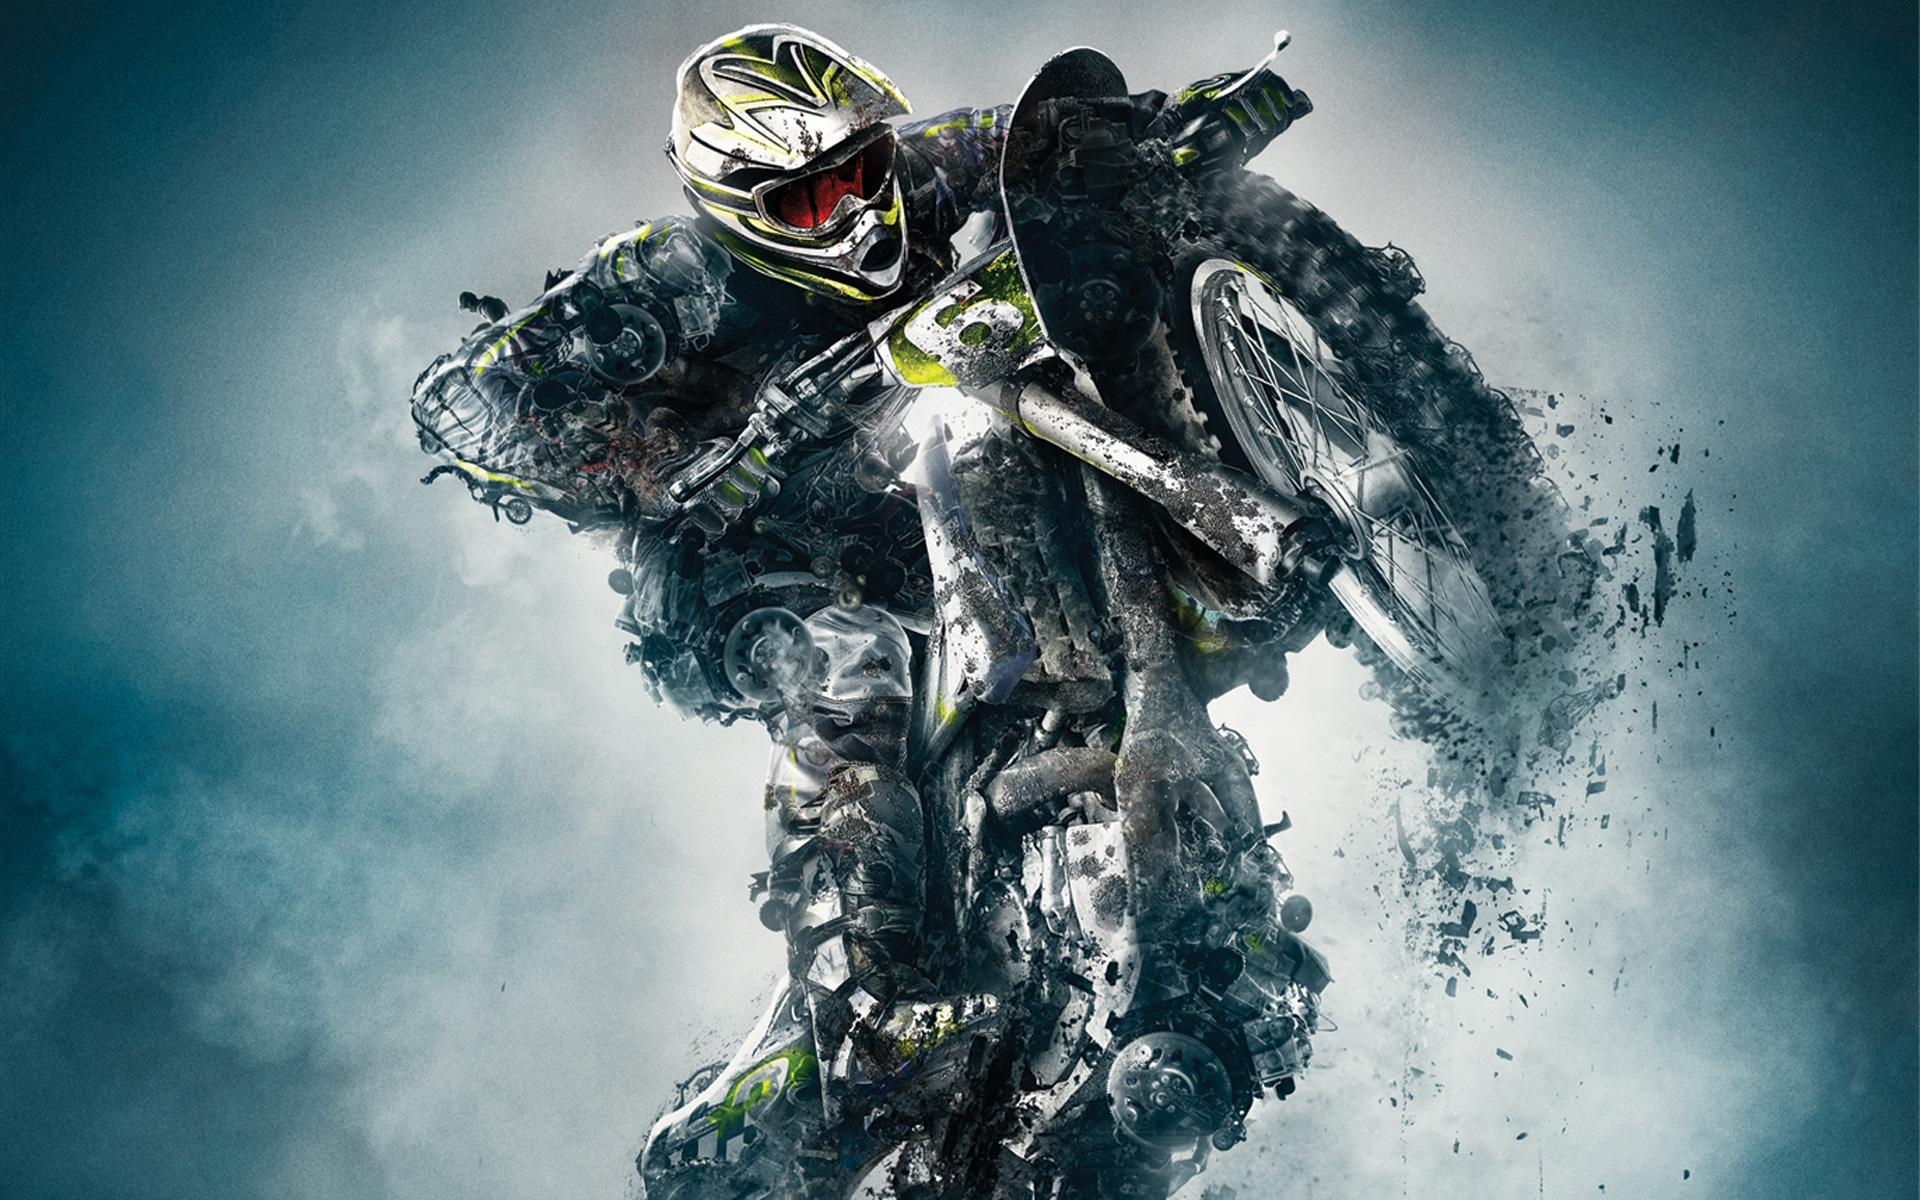 Motocross Wallpaper 32 Motocross Wallpapers ID55RX 1920x1200